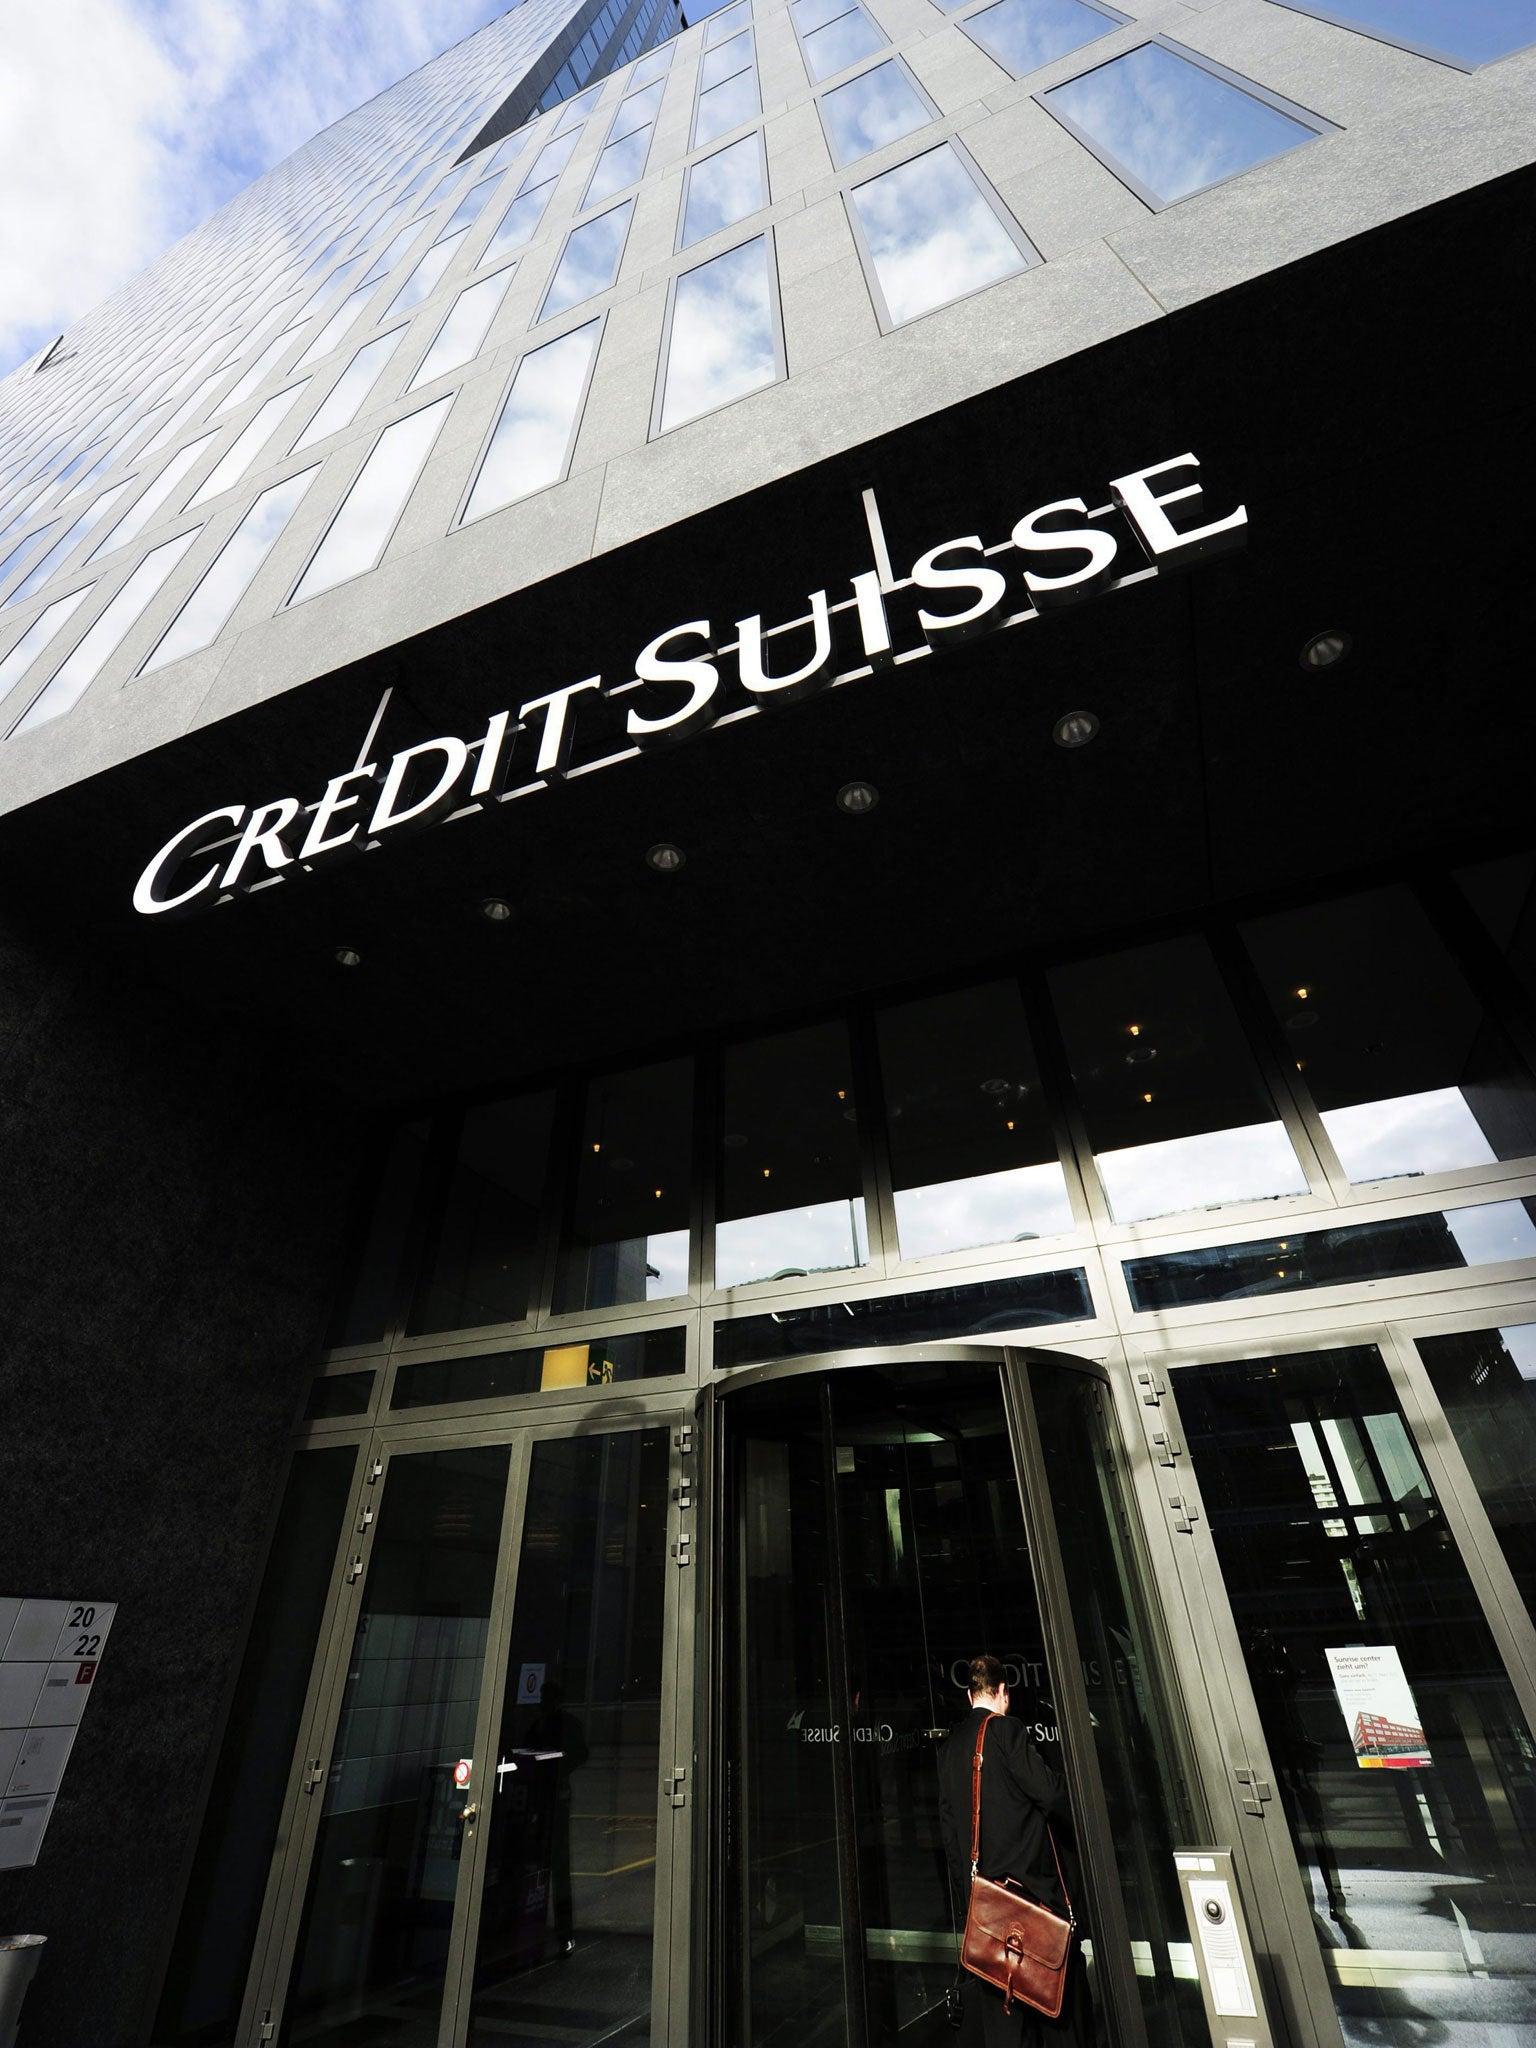 Samsclub Credit Login >> Hacking scandal: Blue-chip firms that used corrupt private ...